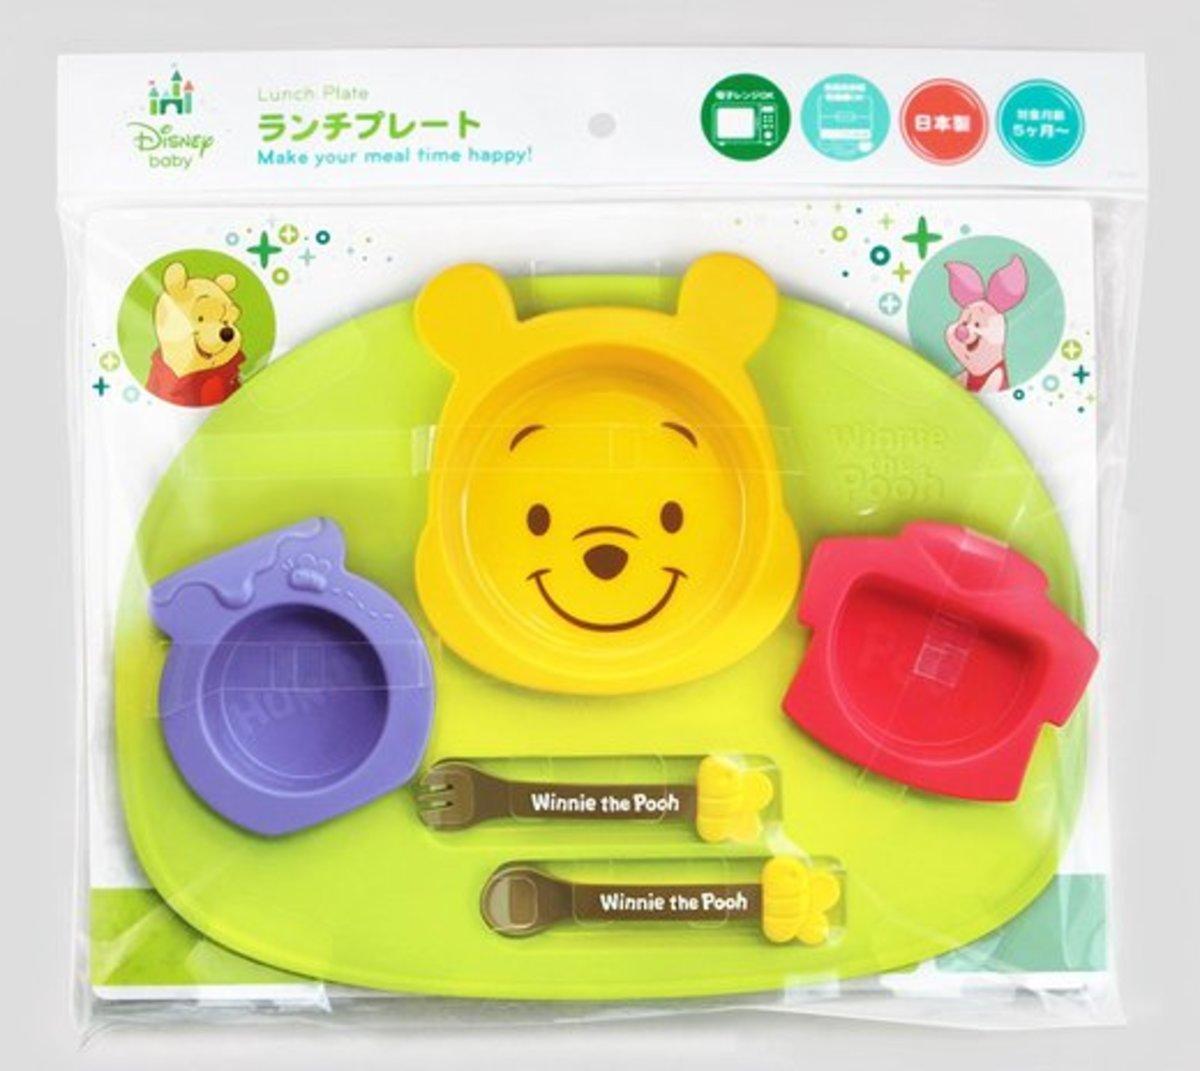 (Winnie the Pooh) (1 set of 6 pcs) Made in Japan Disney Kid's Plastic Cutlery Set